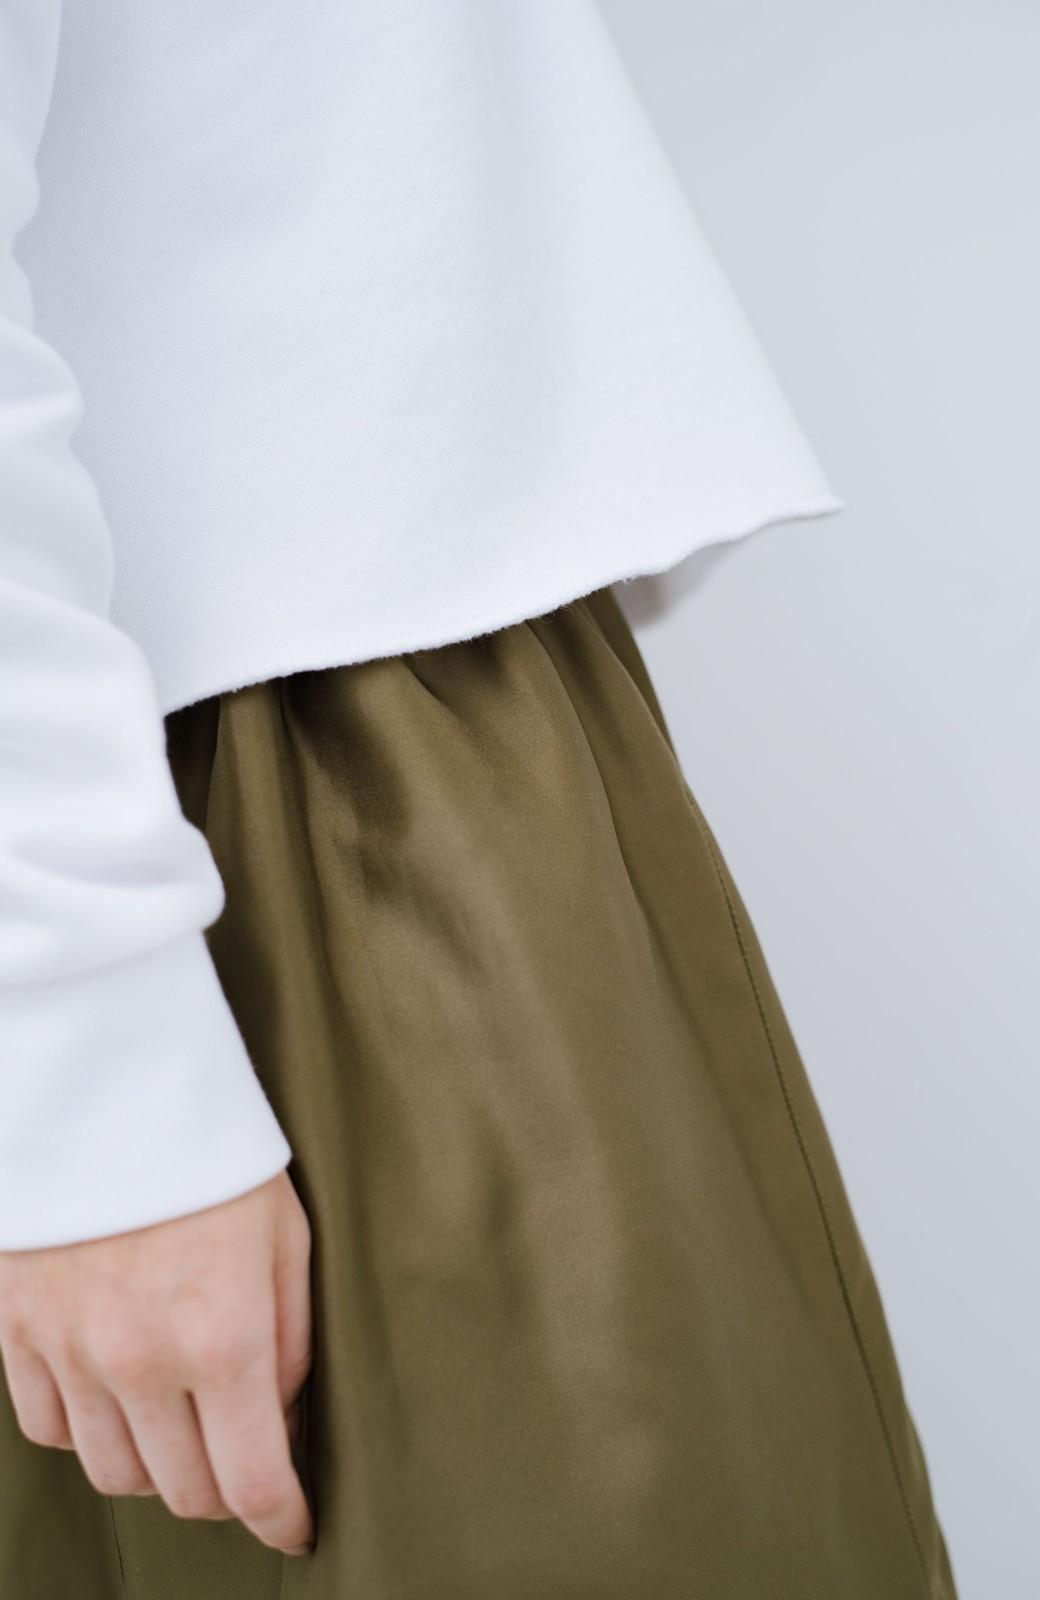 haco! PBPオーガニックコットン 古着屋さんにありそうなかわいい裏起毛パーカー <ホワイト>の商品写真4